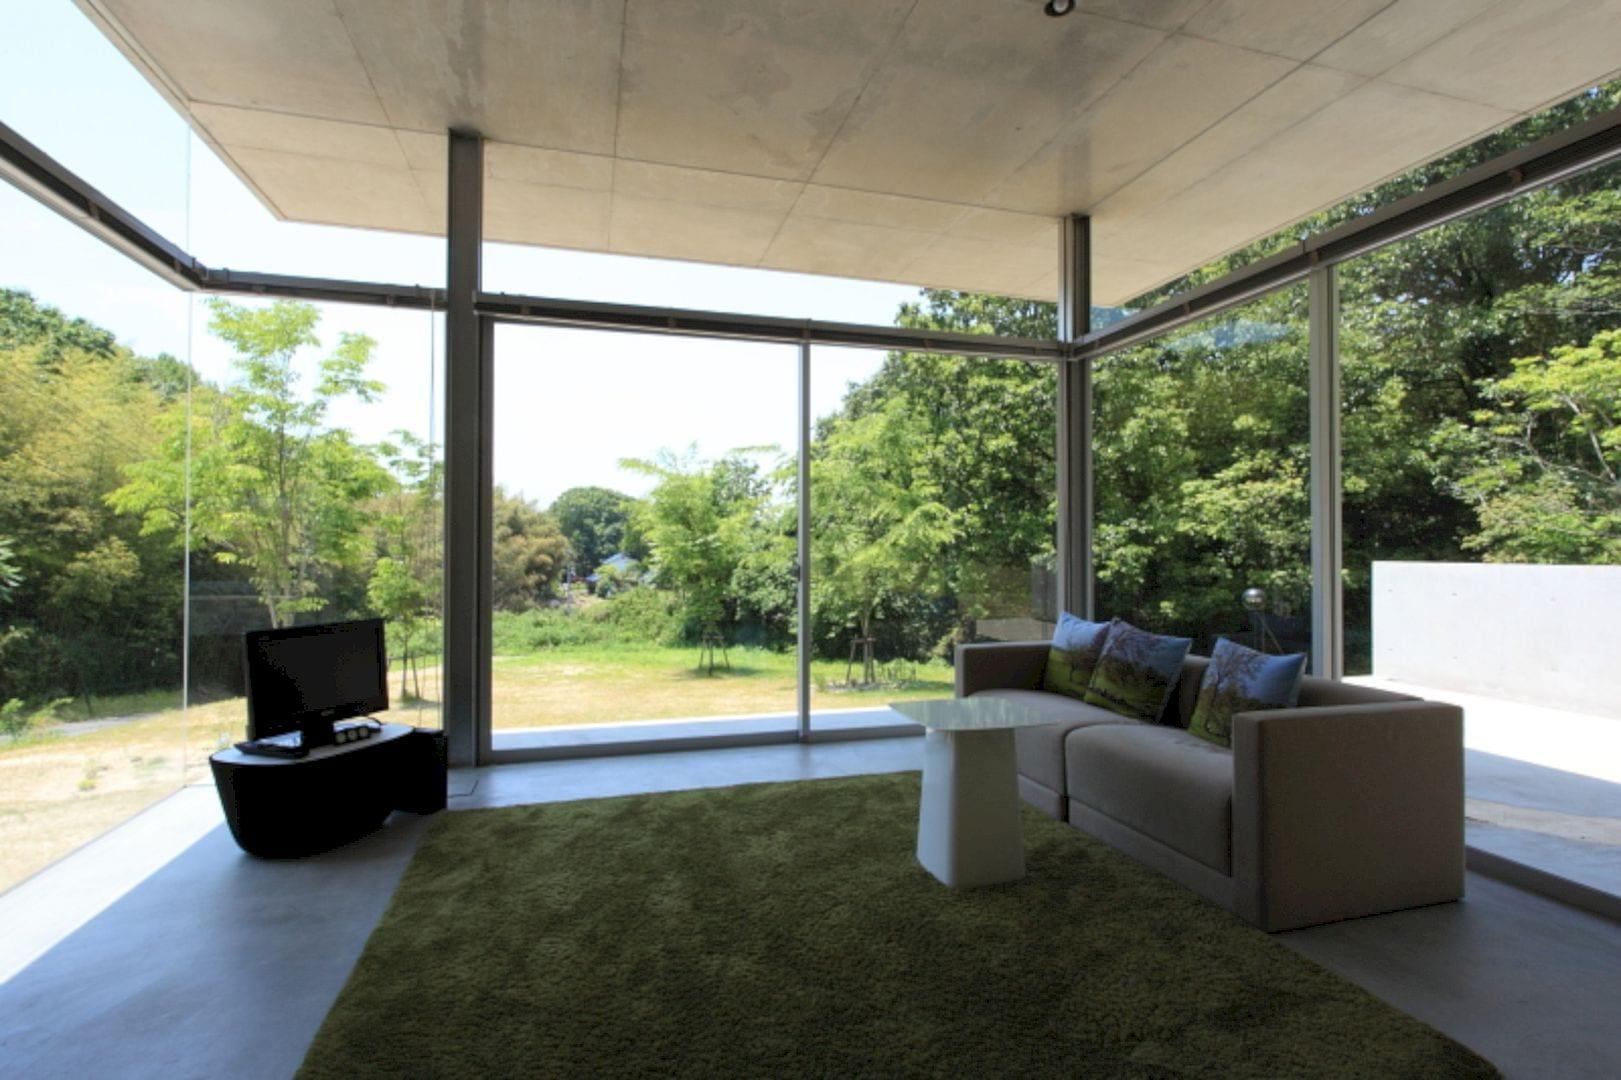 House In Ibara By Kazunori Fujimoto Architects 4